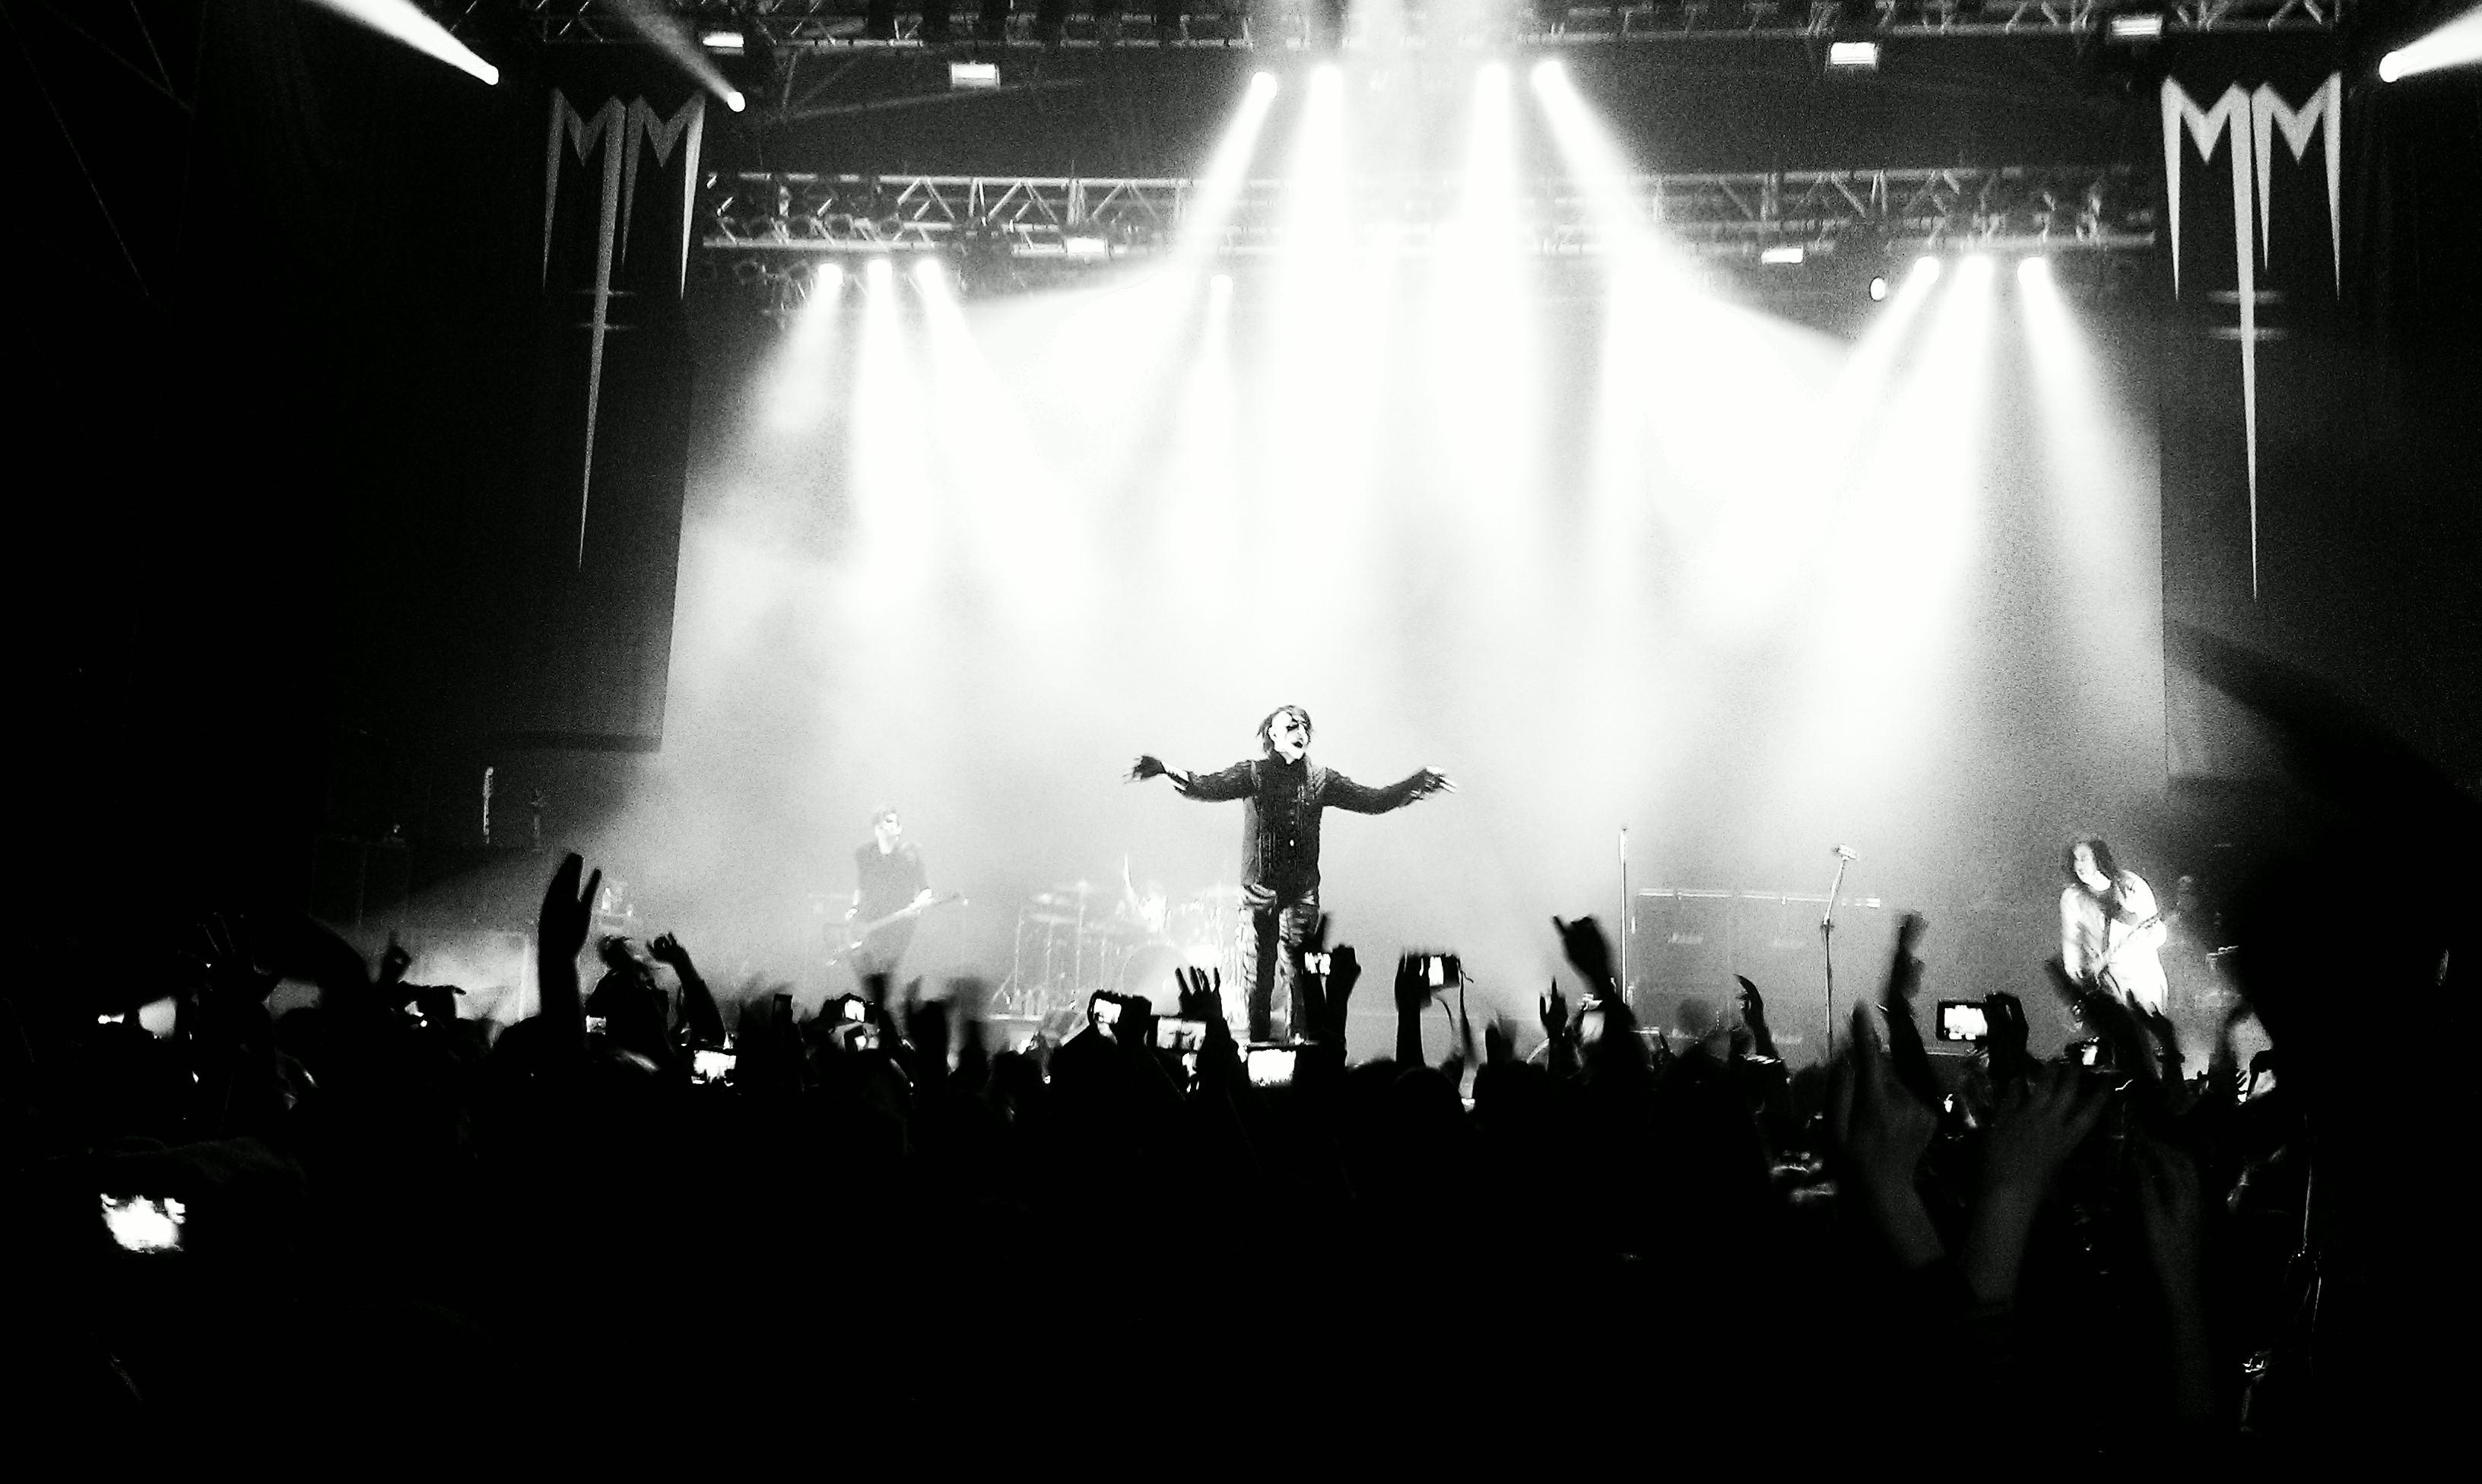 File:Marilyn Manson 2012.jpg